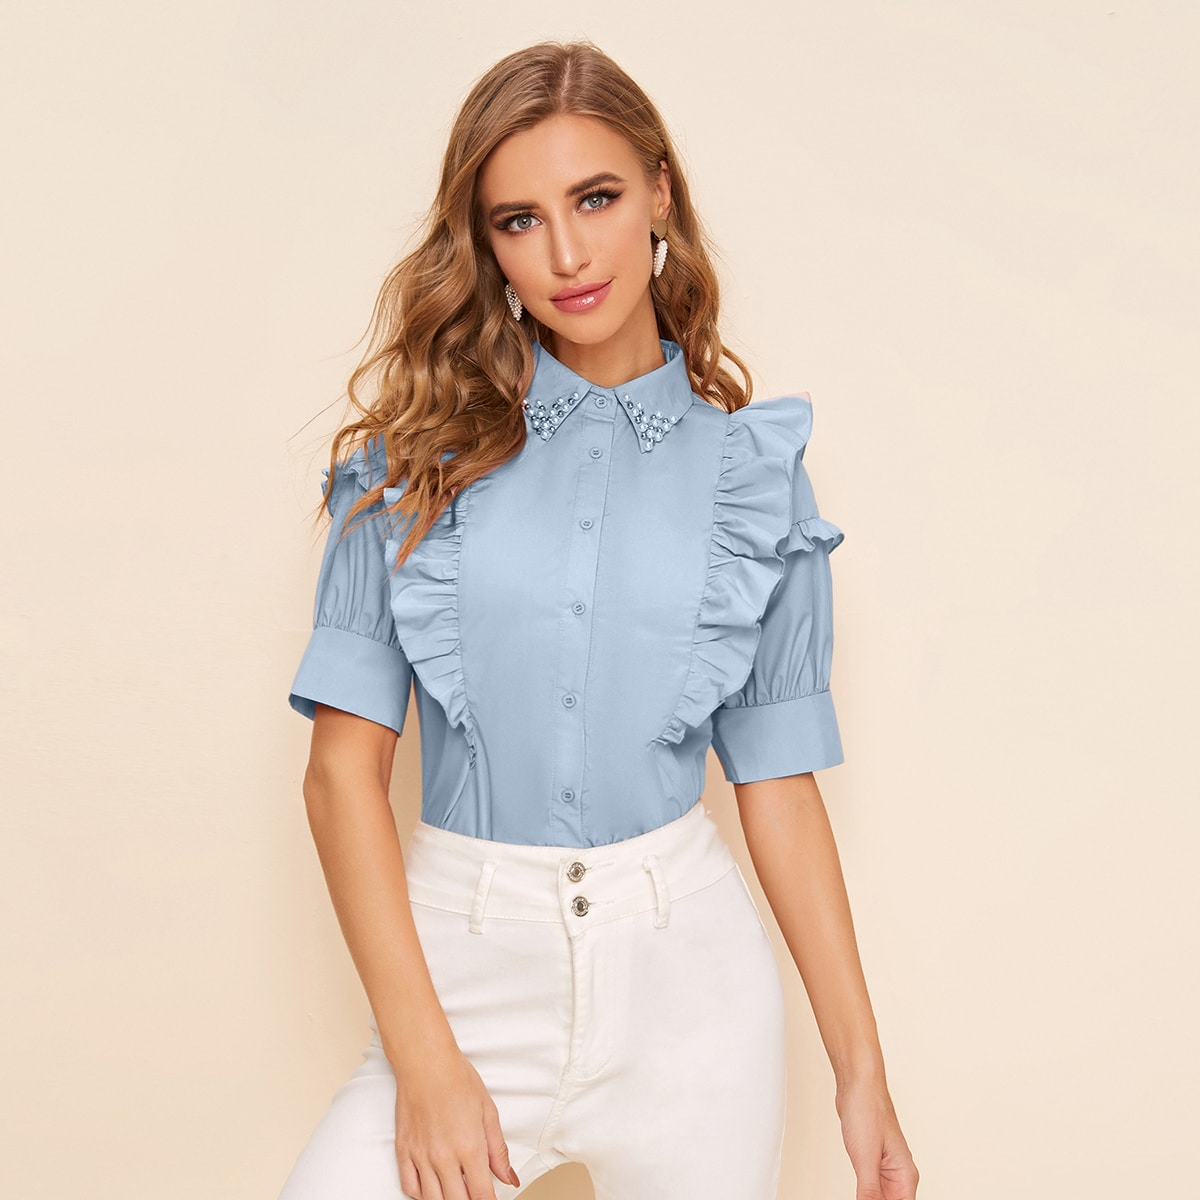 Блуза с пуговицами и оборками фото